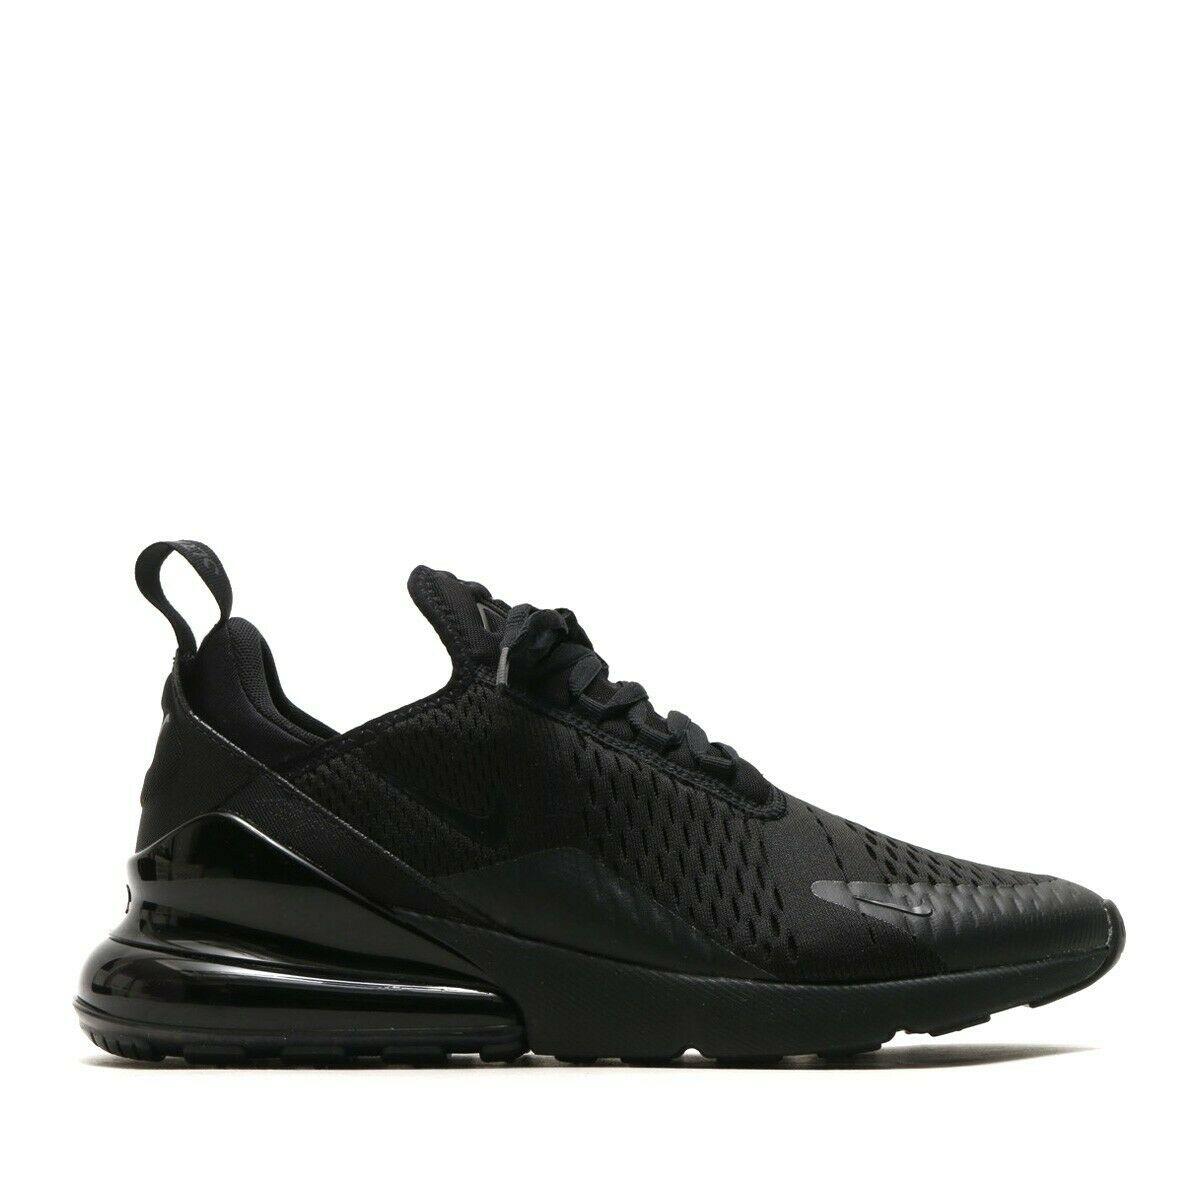 Nike Air Max 270 Herren Sneaker limitiert Neu AH8050 005 black black